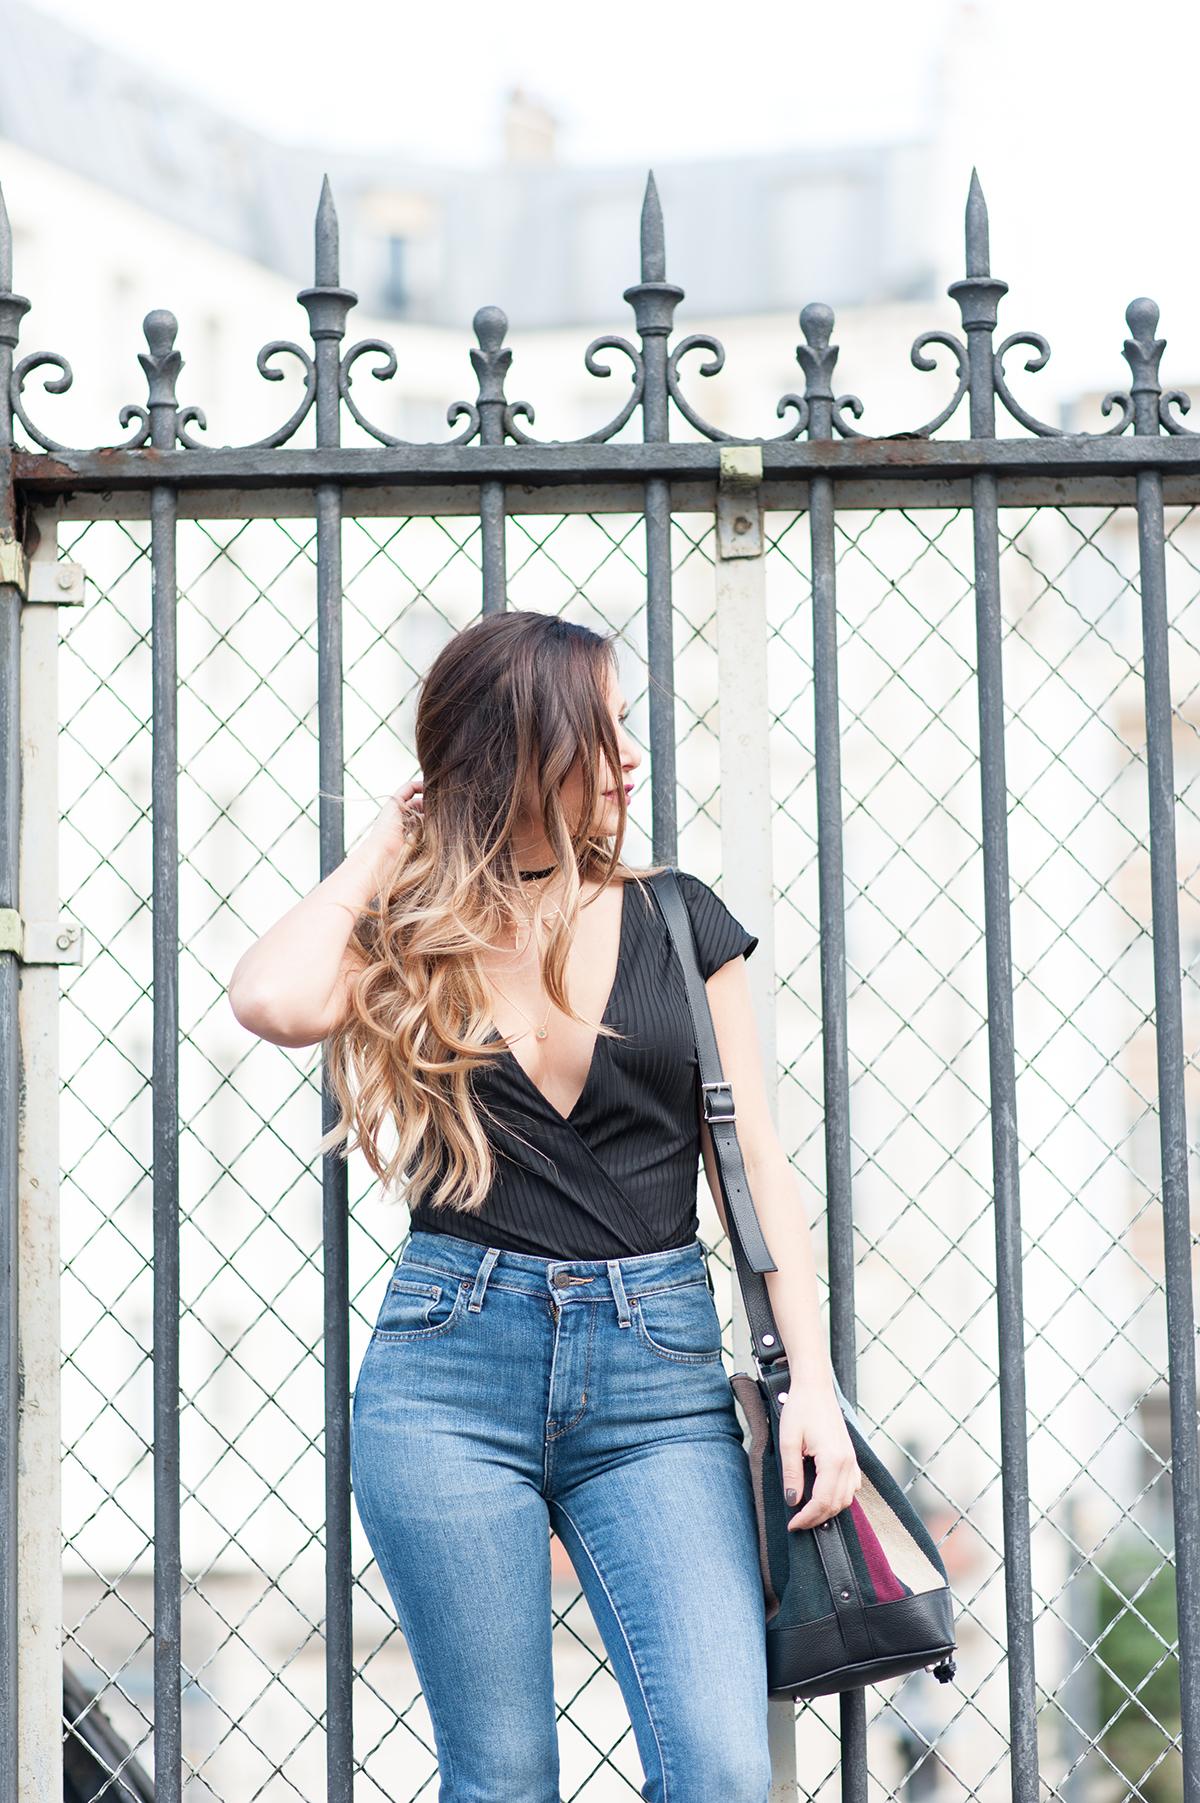 tendance body blog mode